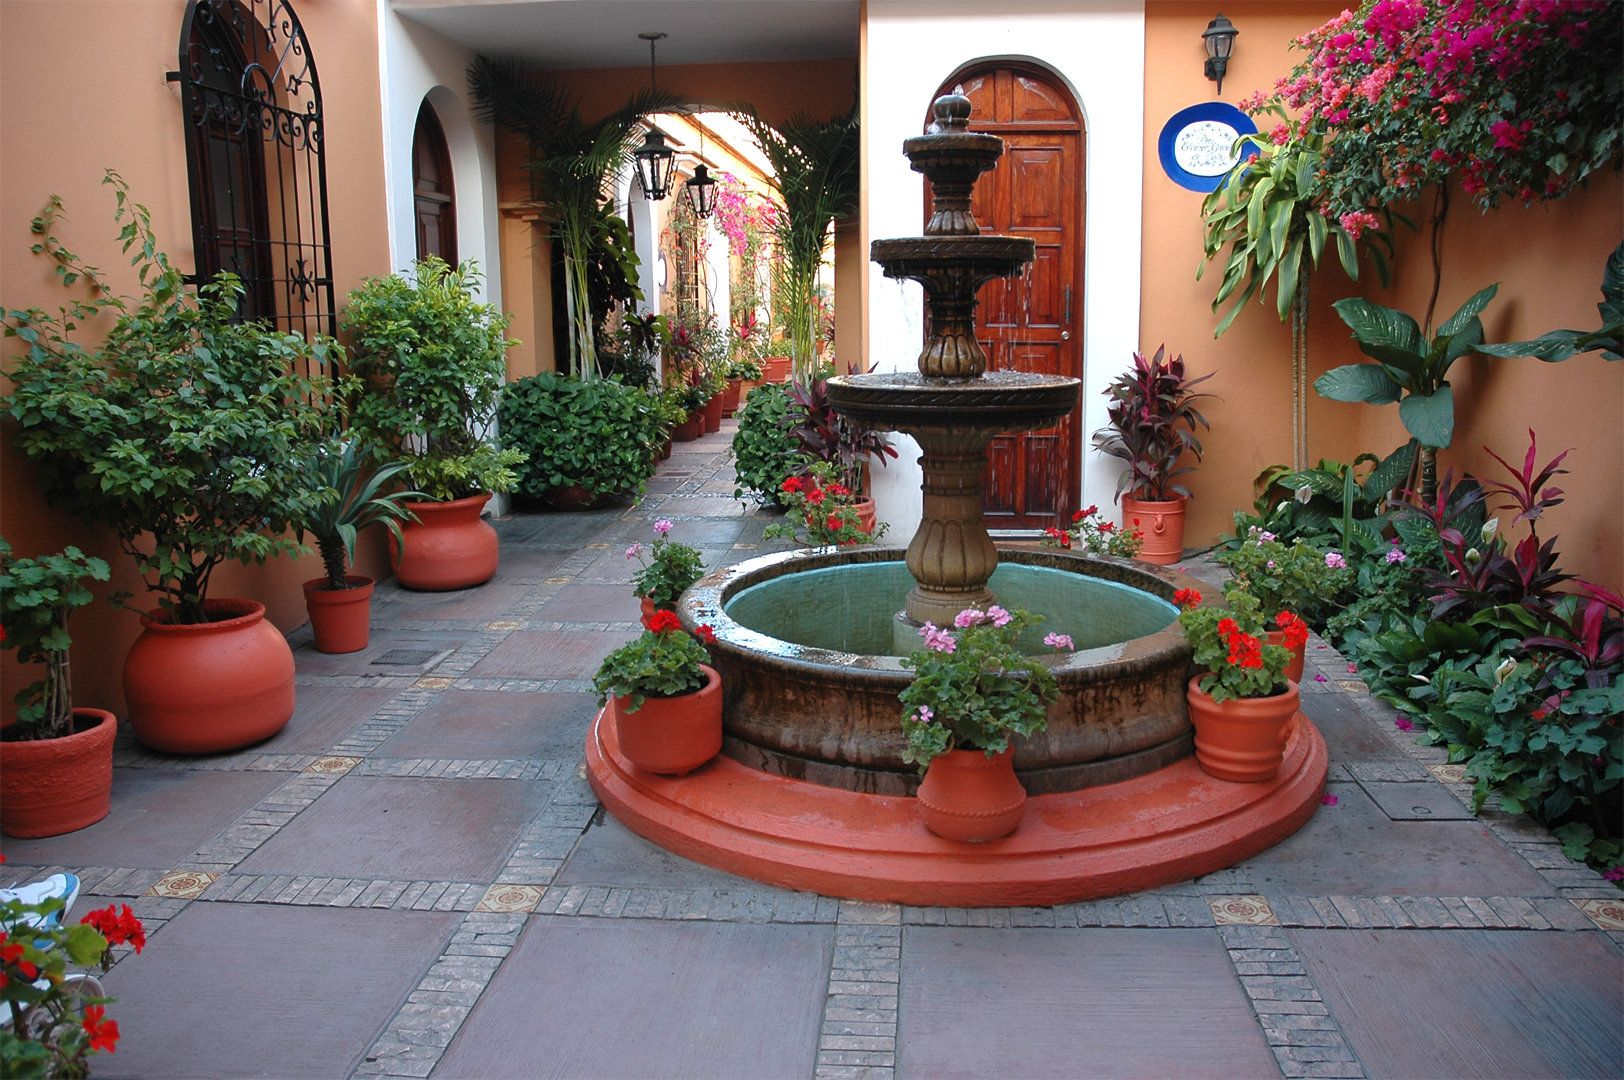 patios mexicanos by alejandraferrar on Pinterest | Mexican ... on Mexican Backyard Decor  id=64759